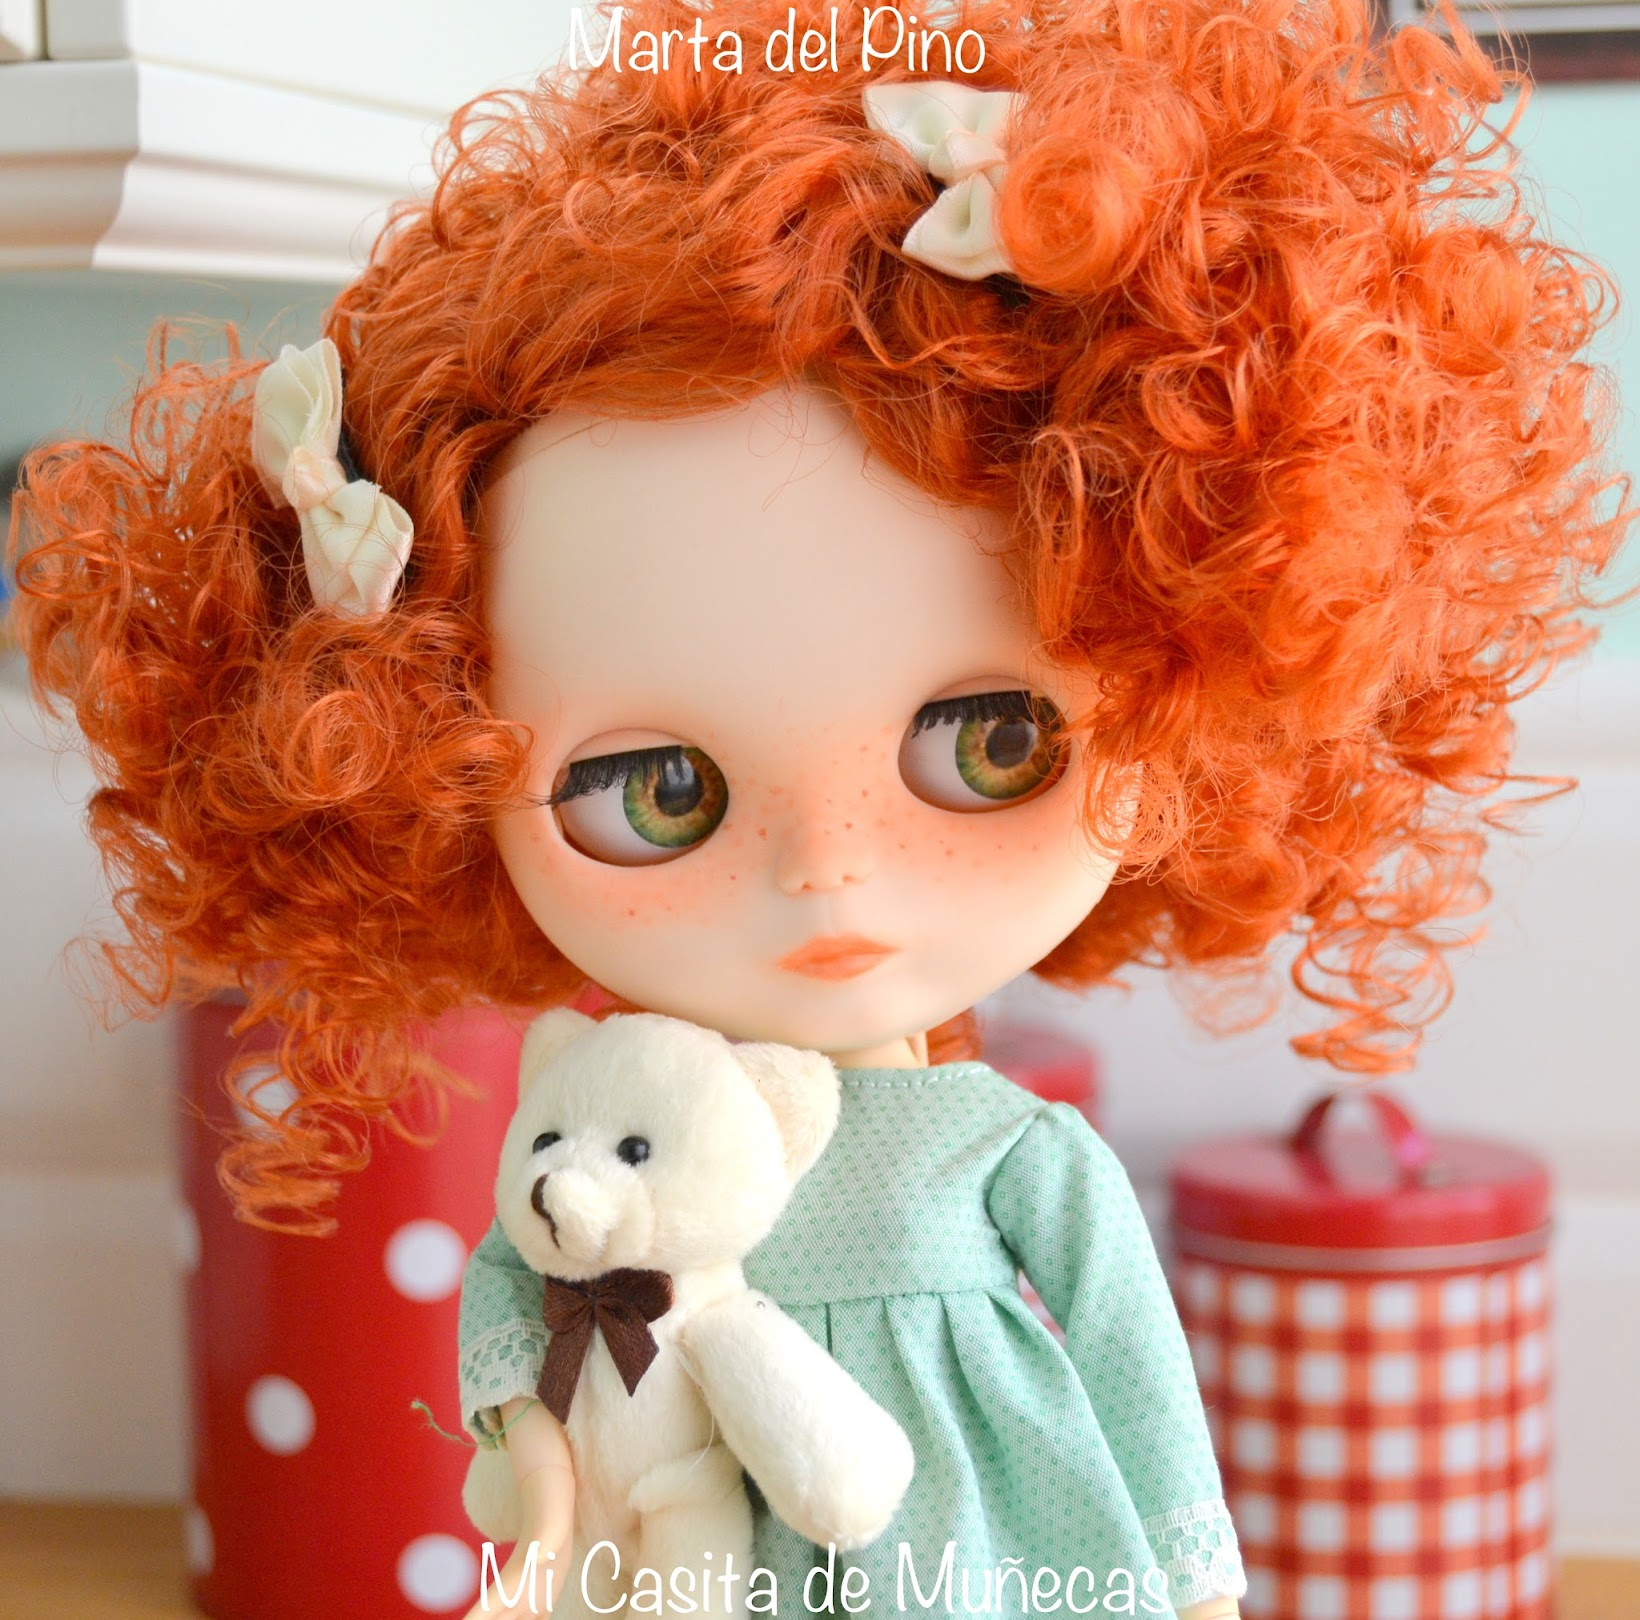 blythe dolls, customizar blythe, eye chips, mi casita de muñecas